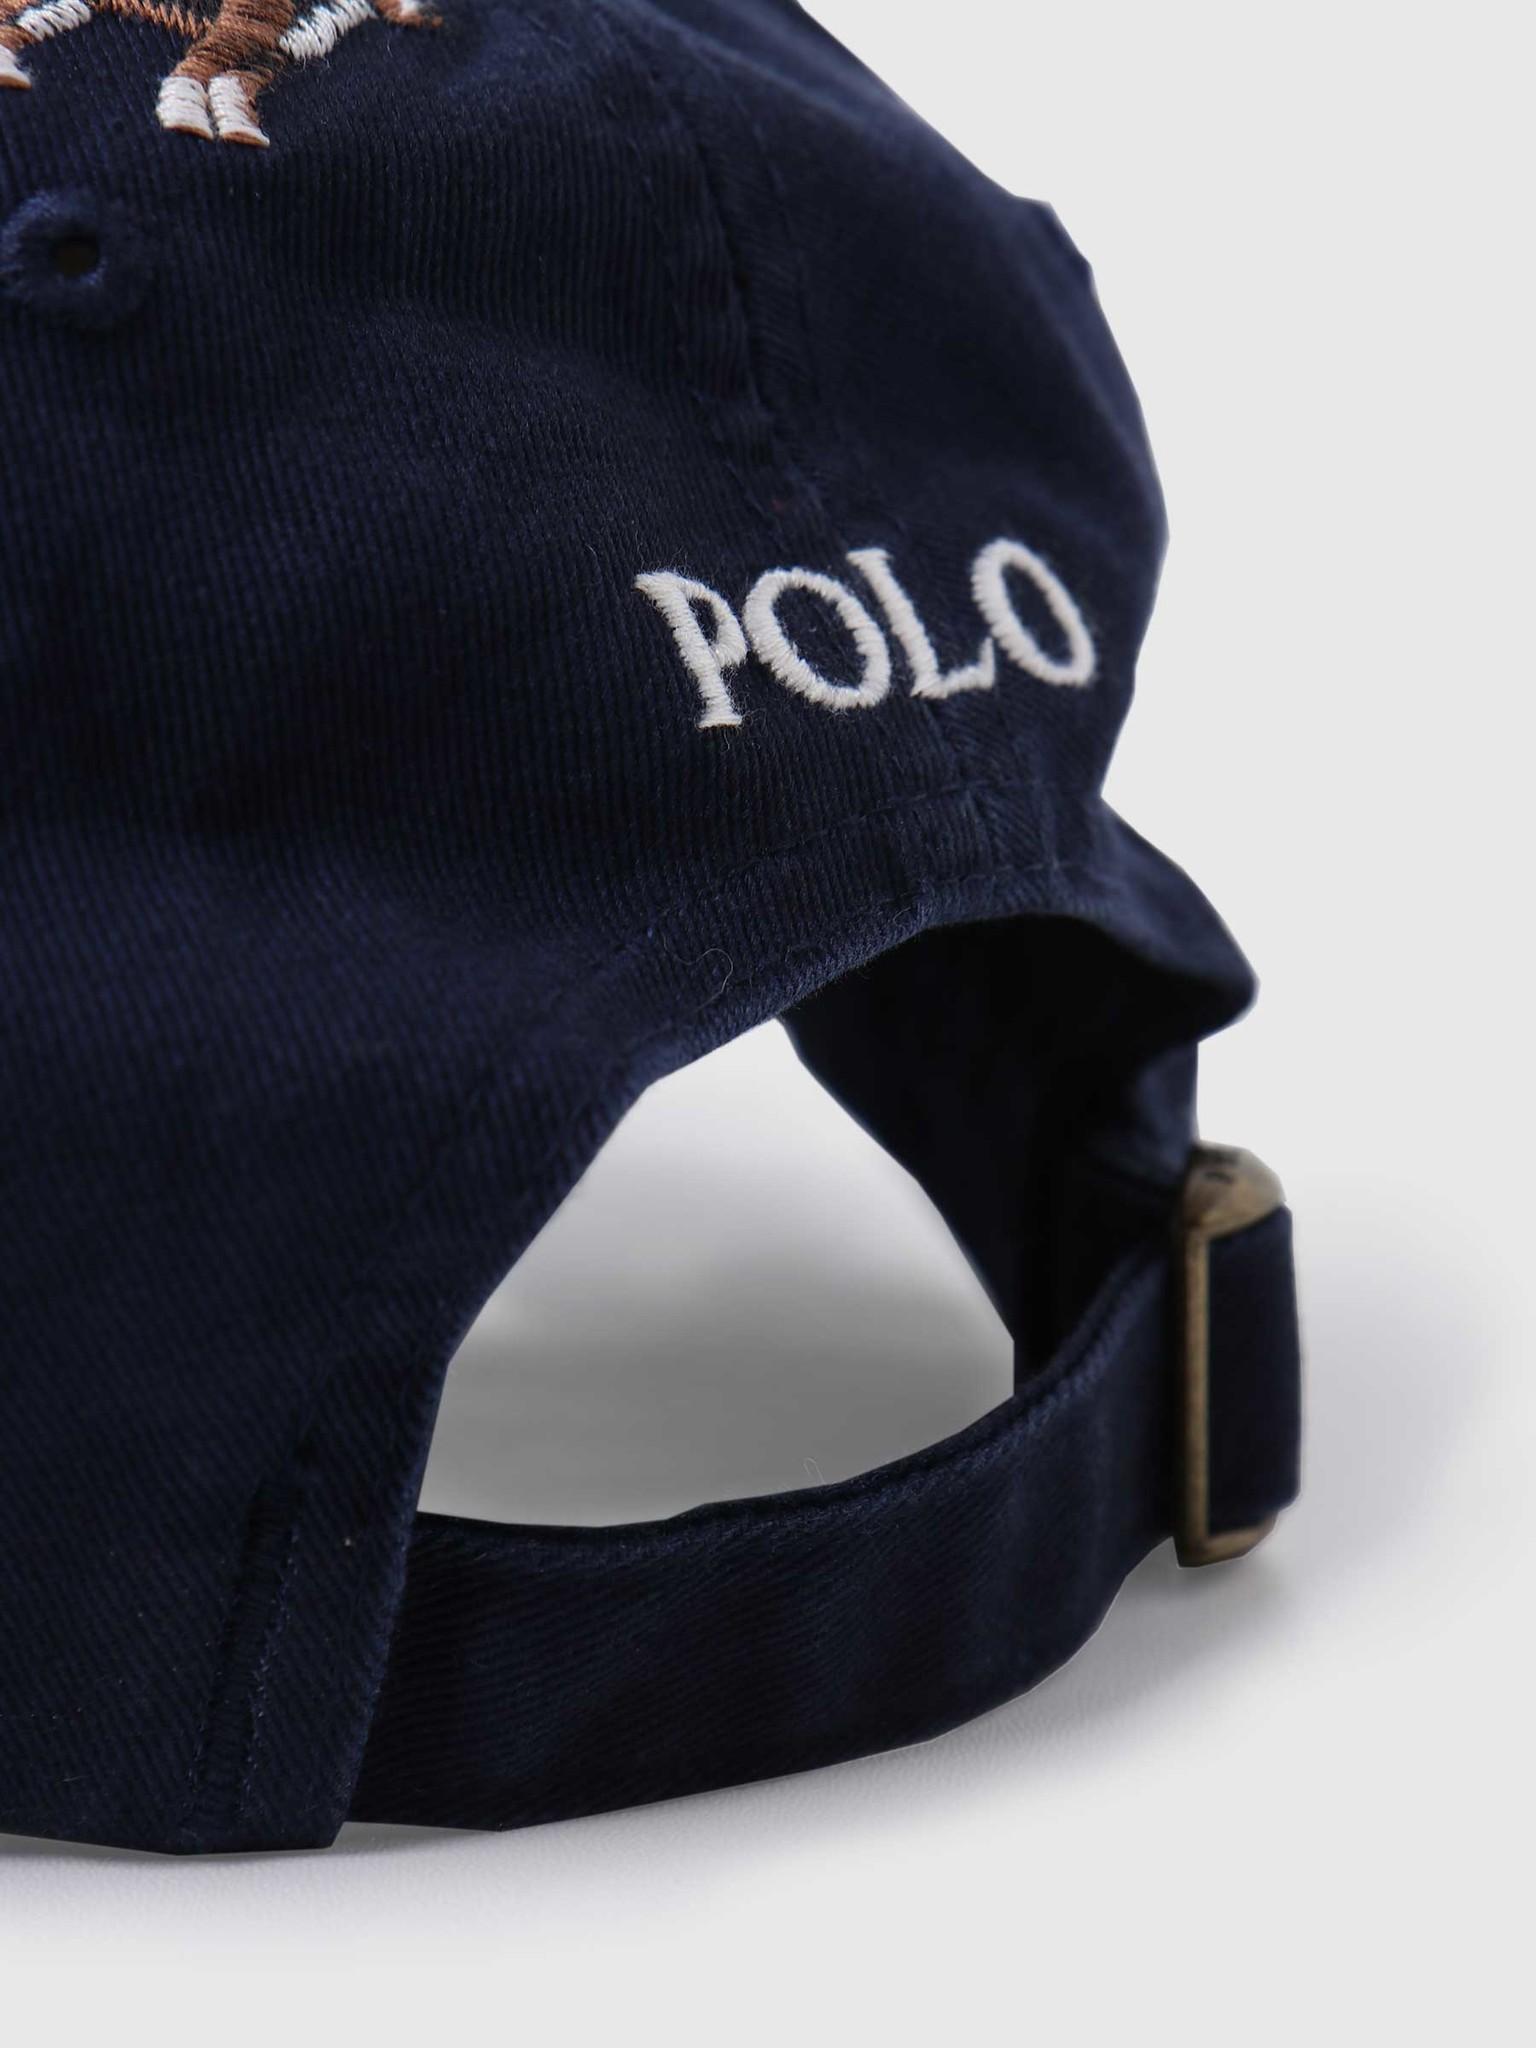 Polo Ralph Lauren Polo Ralph Lauren Classic Sport Cap Hat Cruise Navy W Hound Emb 710813152001